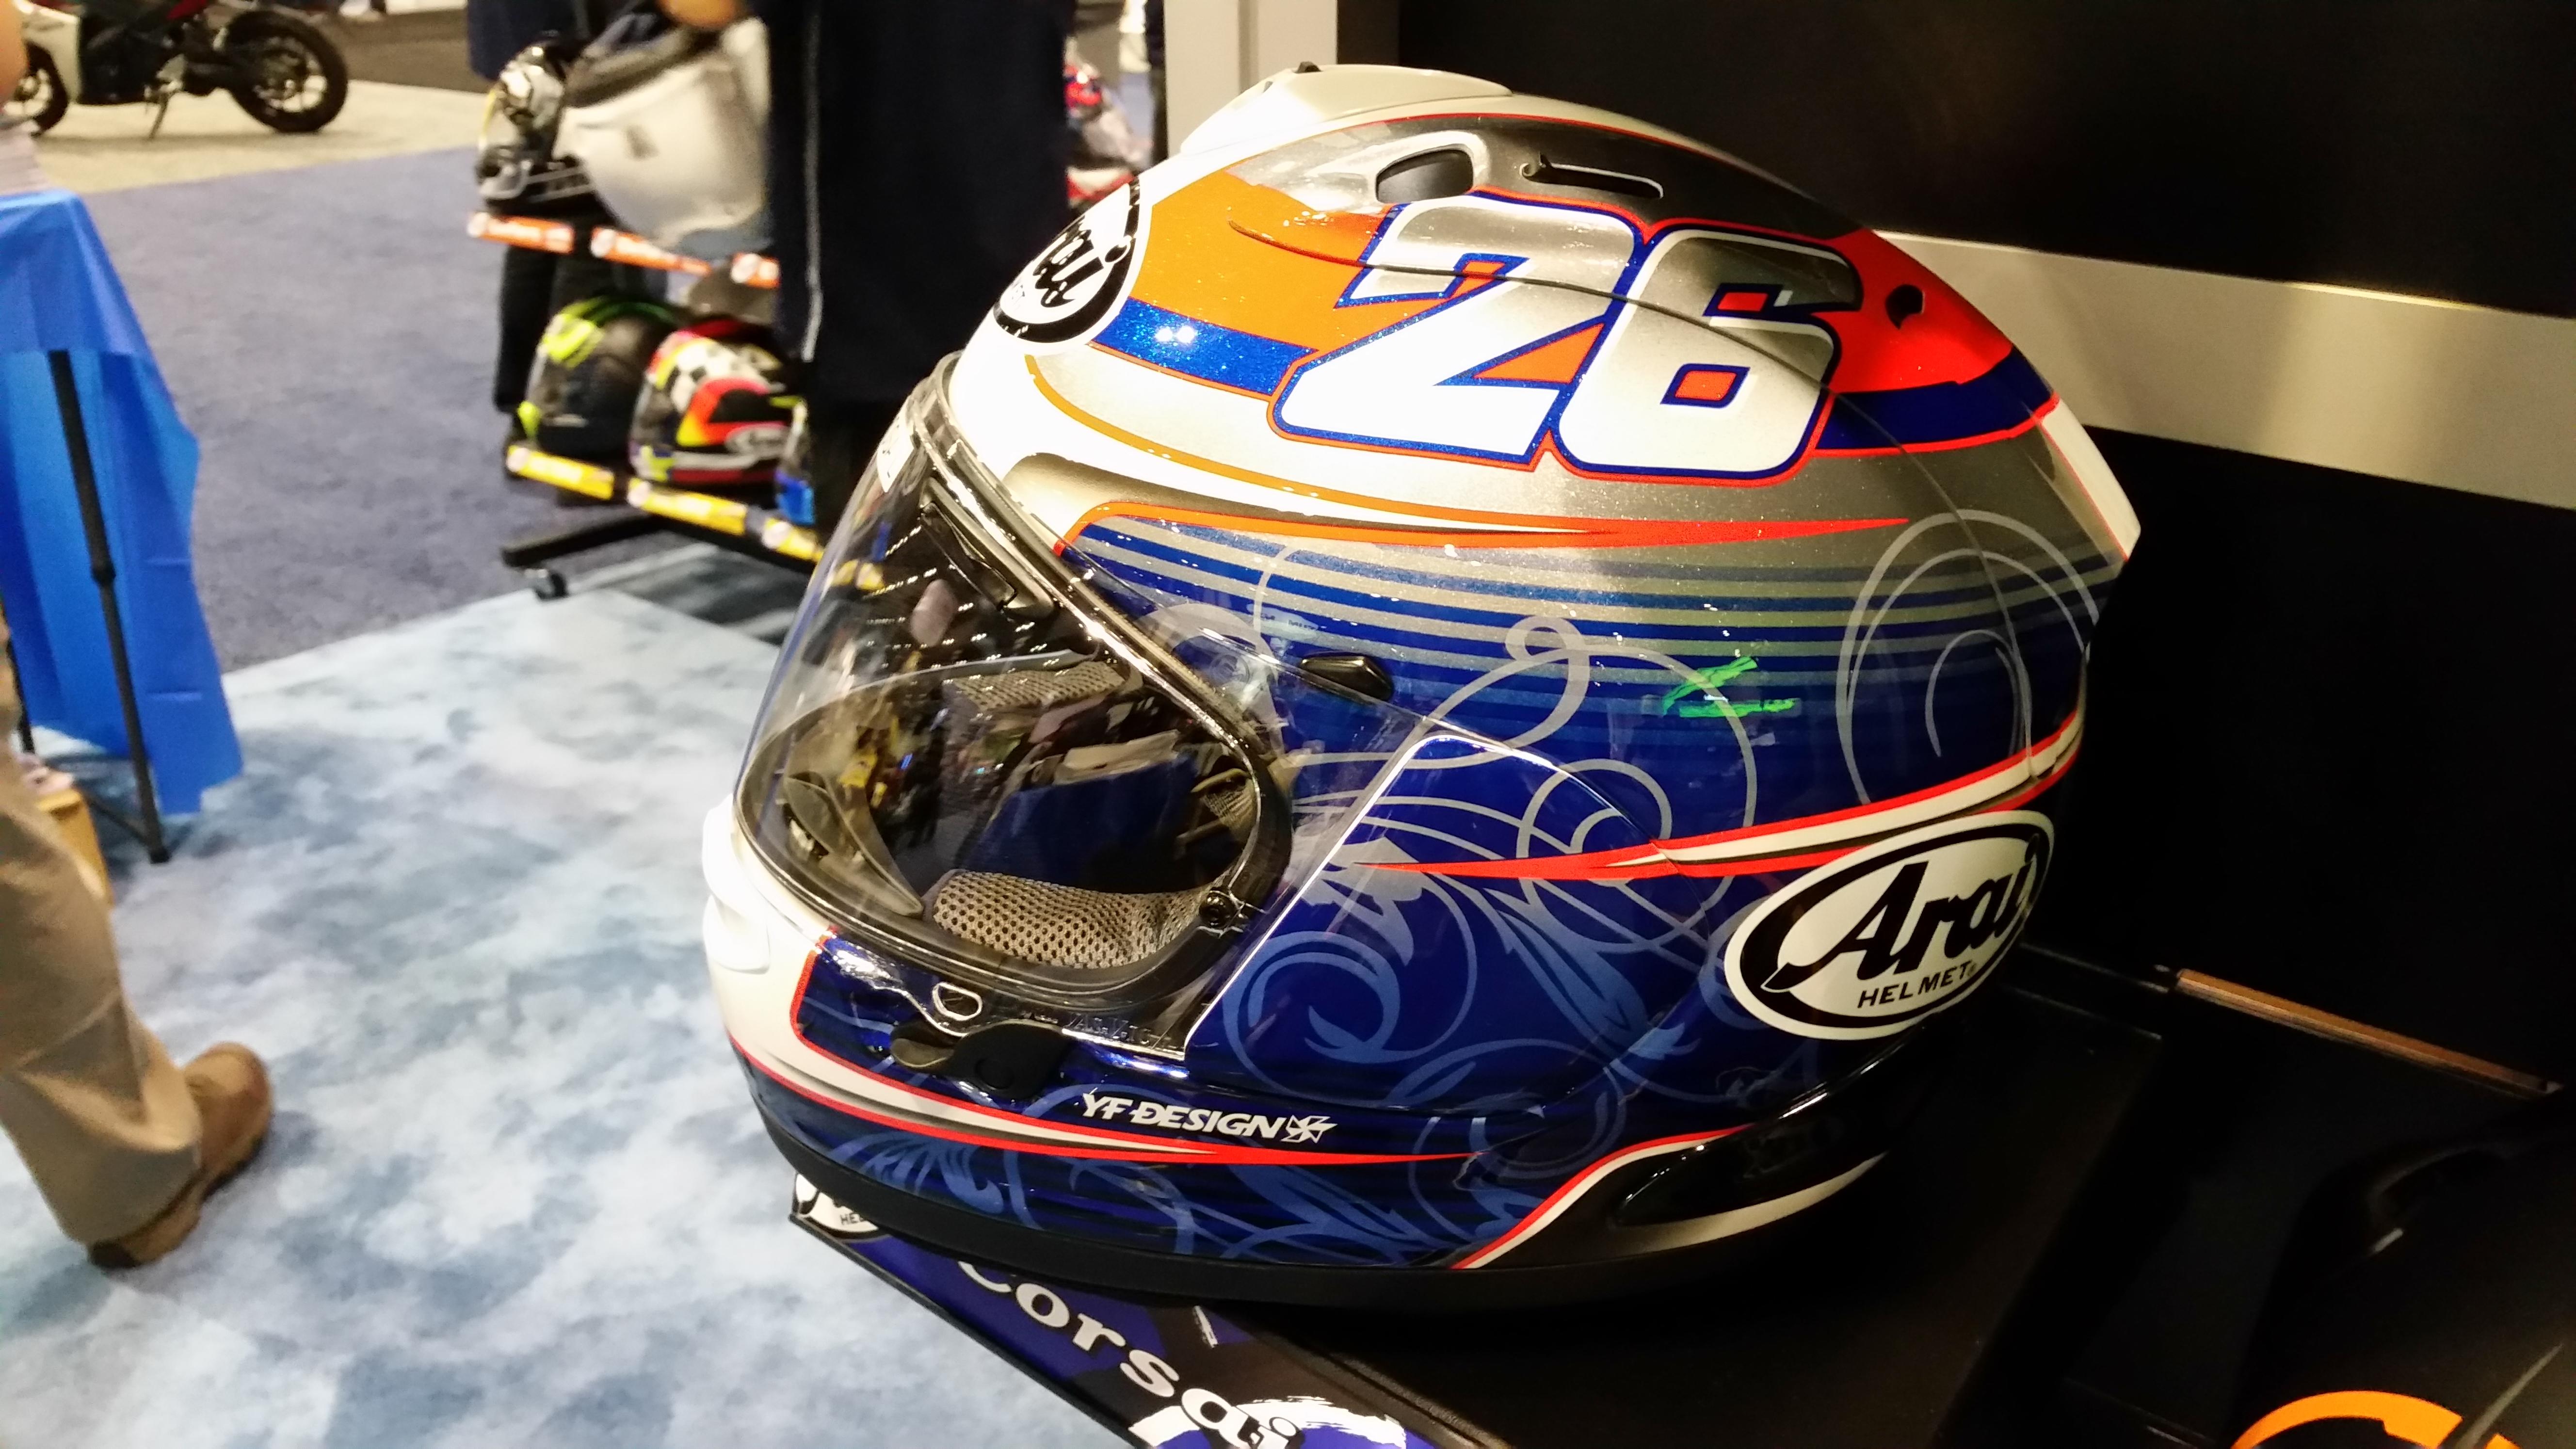 Araih Custom Helmet - Designed by Rider